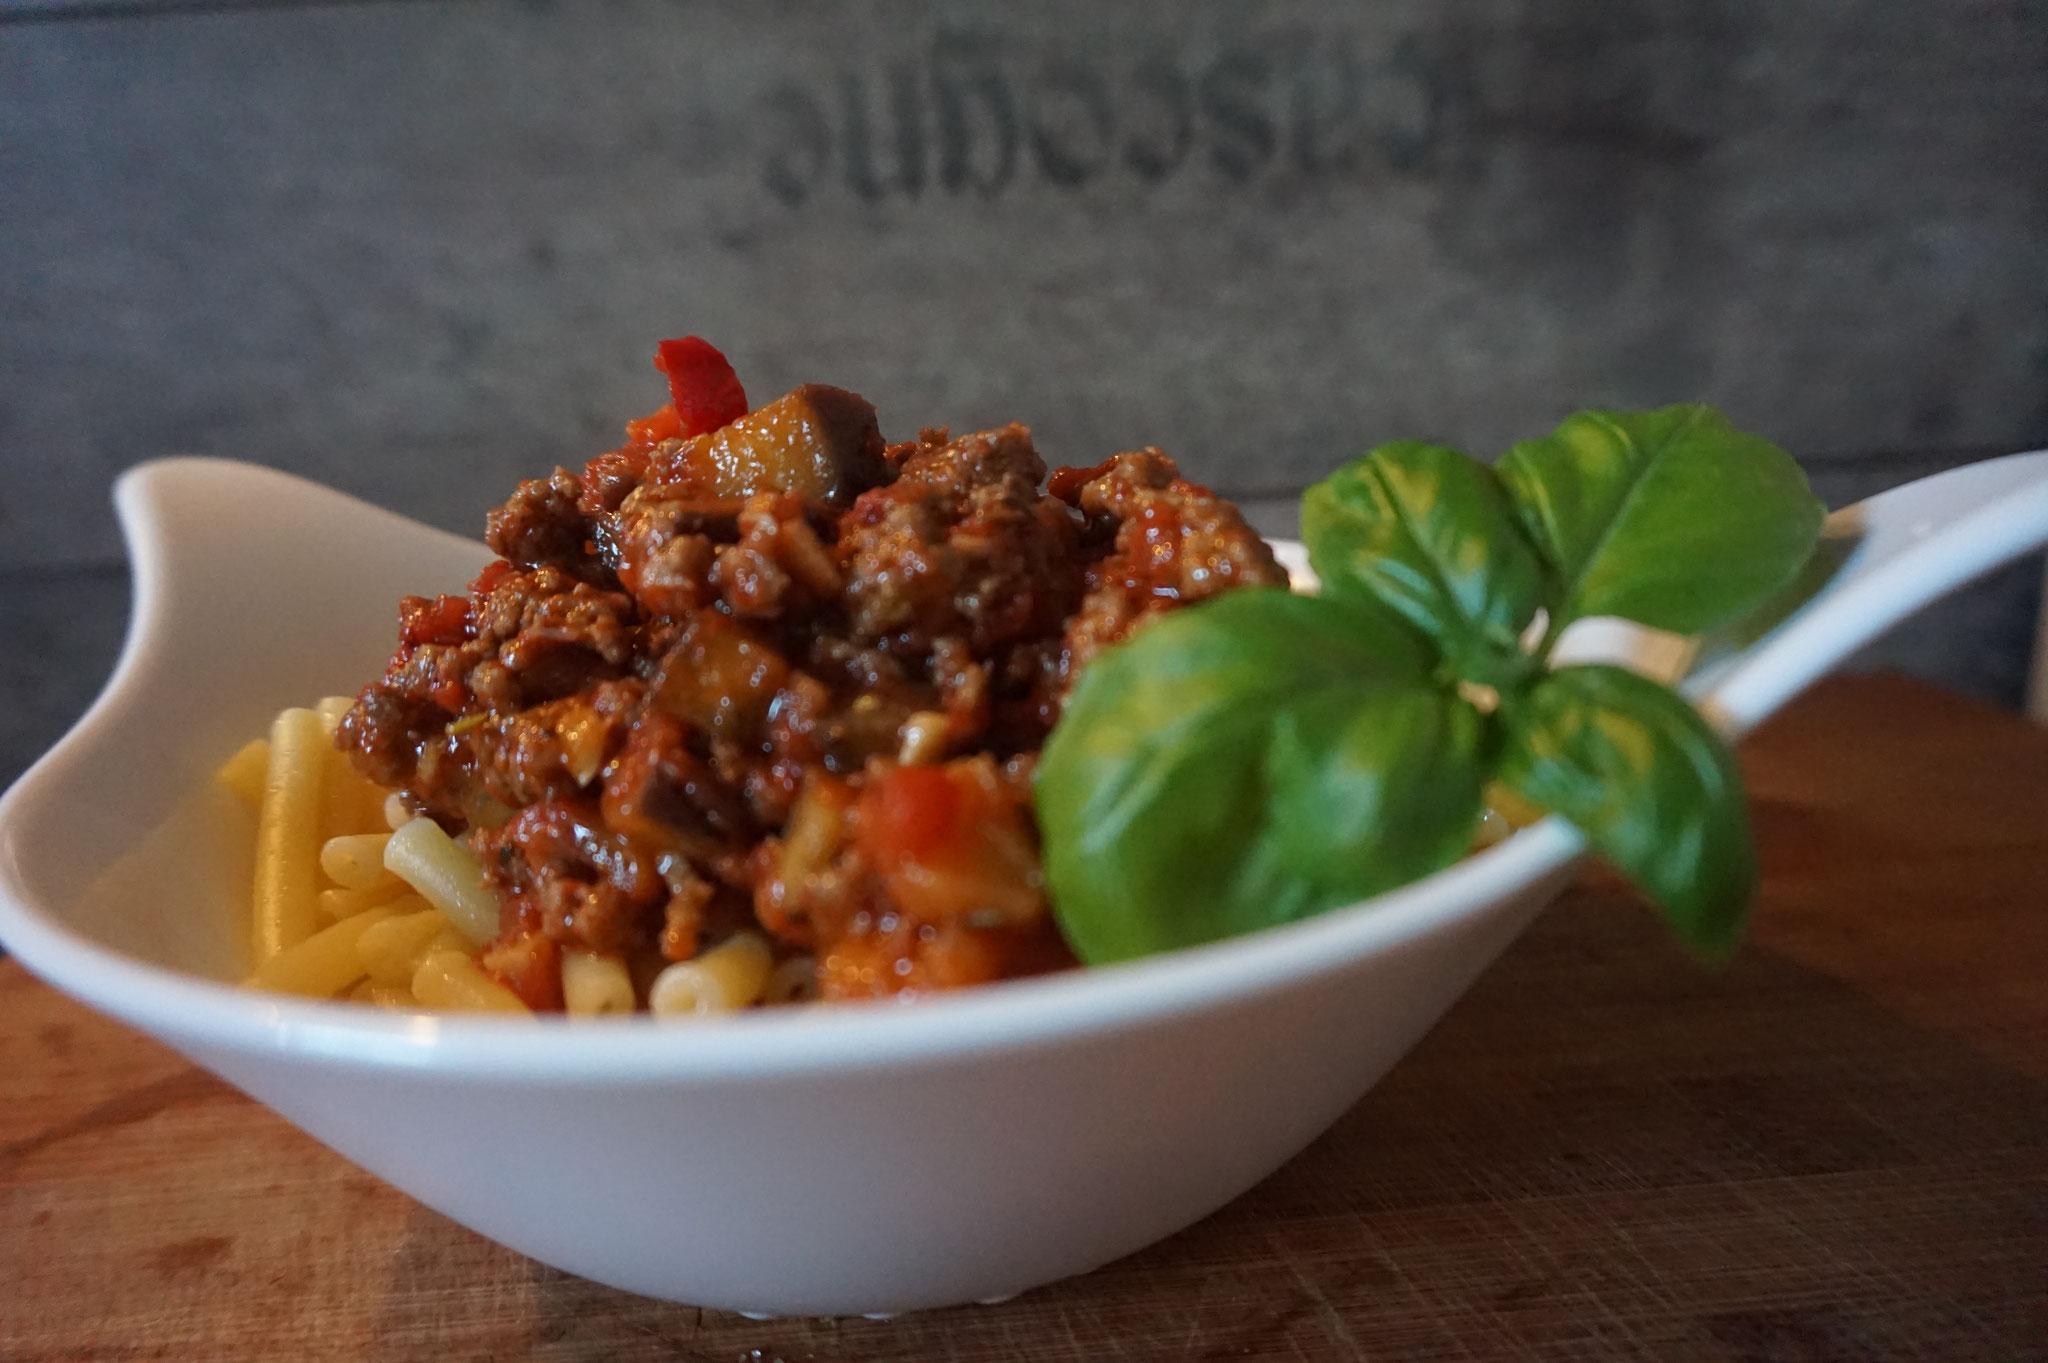 leckere maccaroni spaghetti mit gemuese hackfleisch low carb foodblog. Black Bedroom Furniture Sets. Home Design Ideas